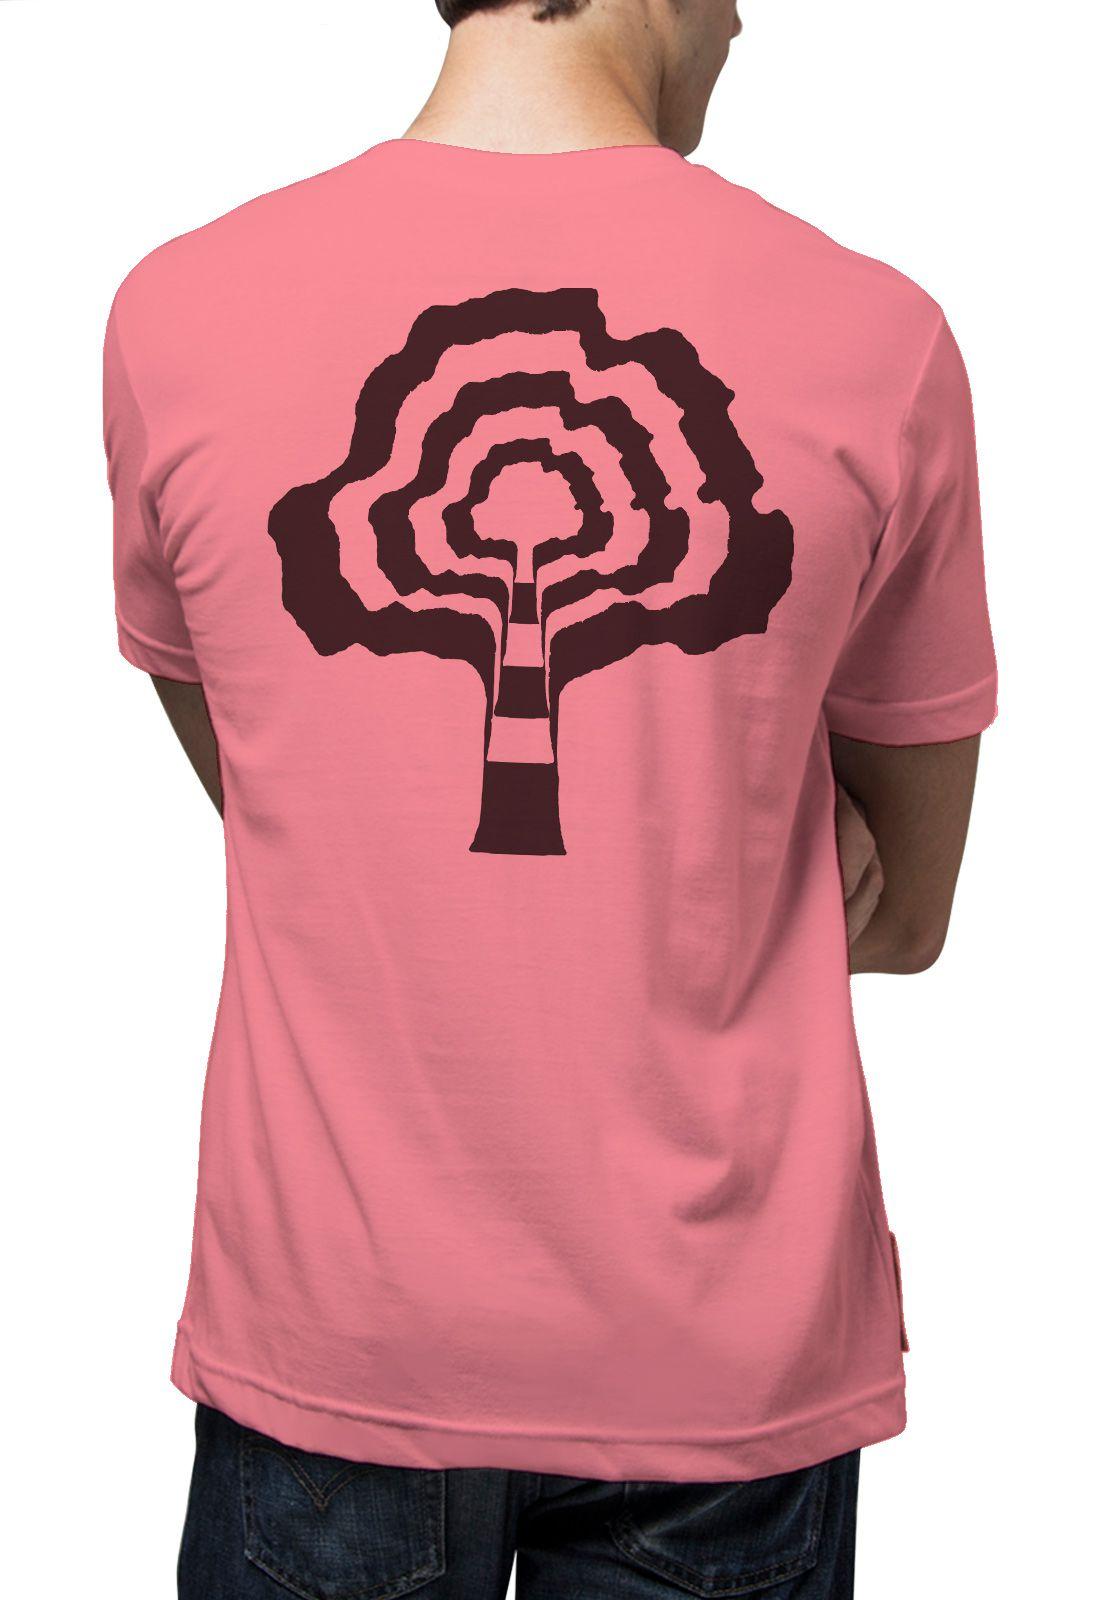 Camiseta Amazônia Psicodelic - Rosa